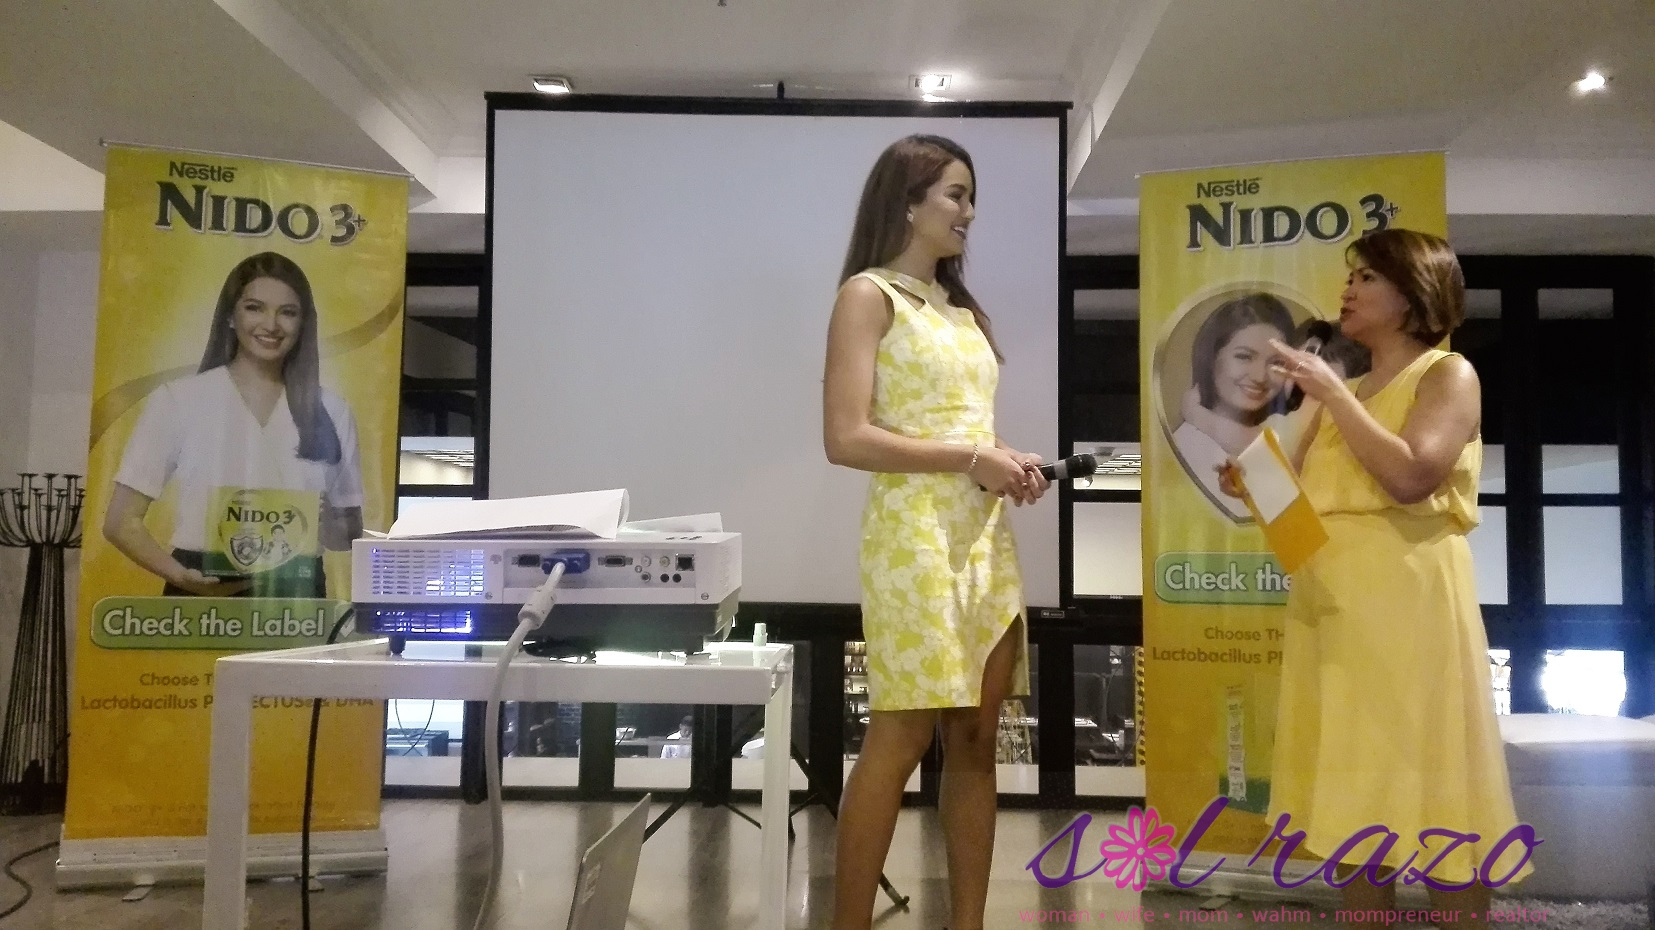 Sarah Lahbati Nido 3+